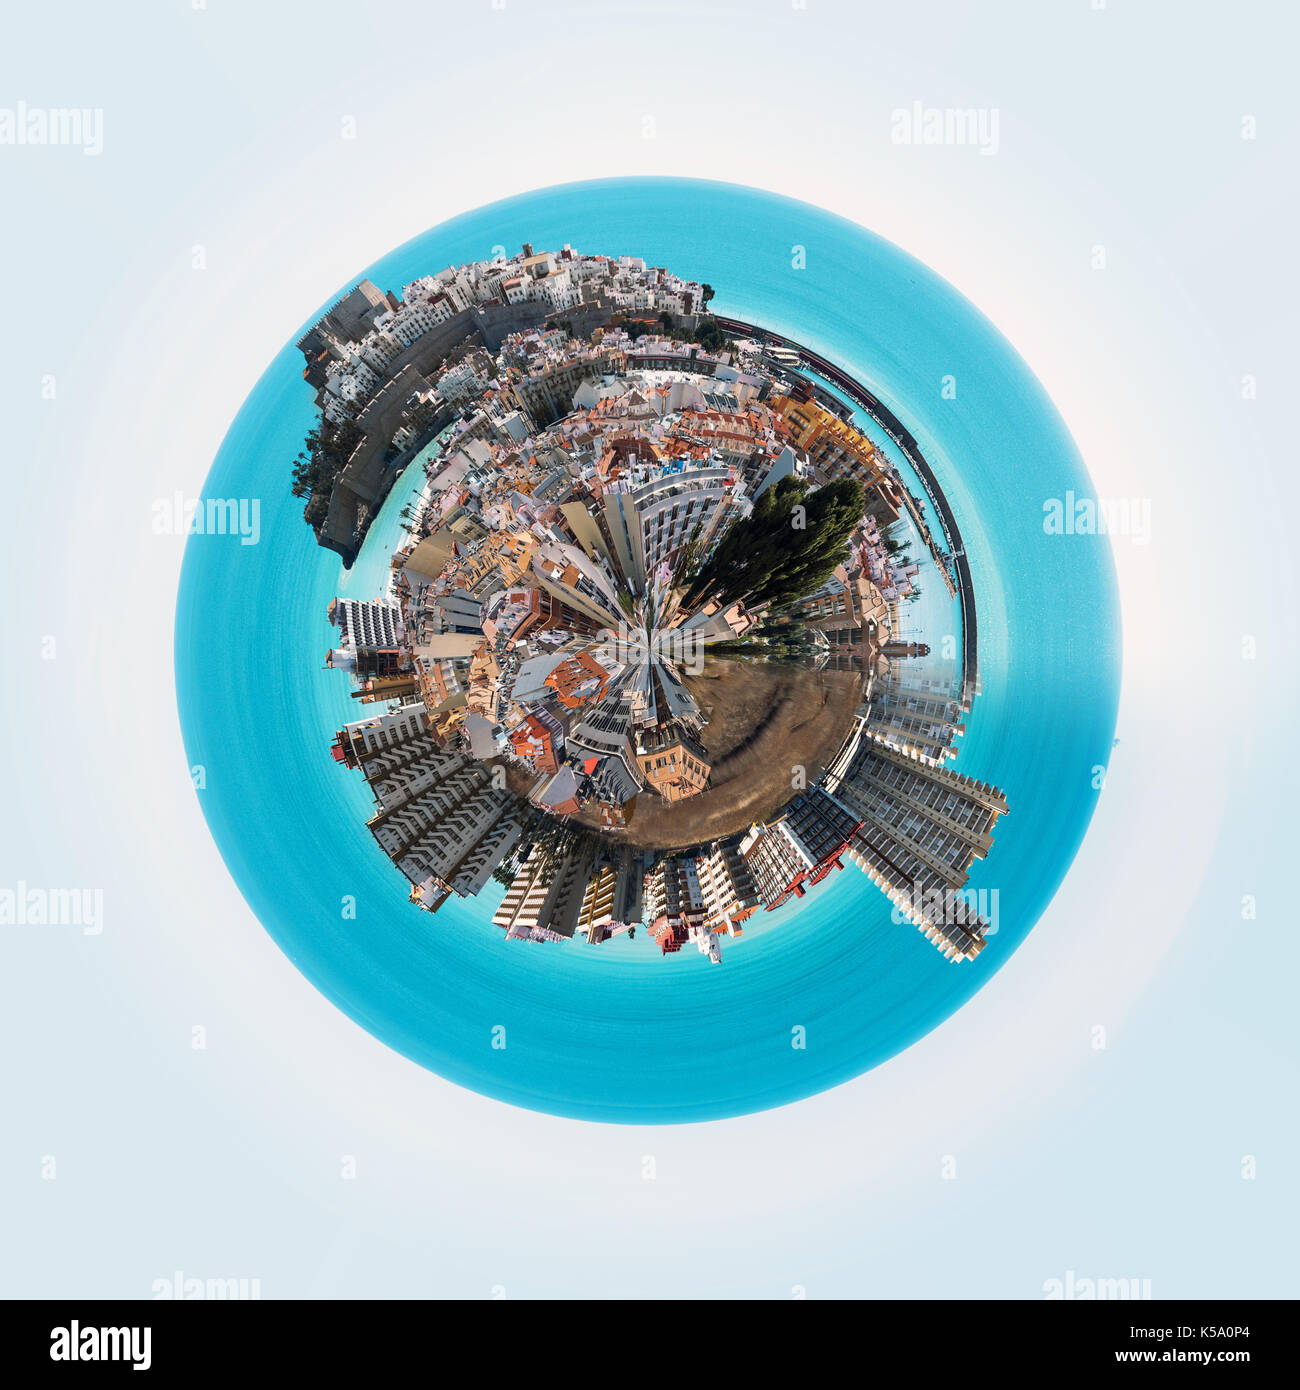 Little planet 360 degree sphere. Panorama of Peniscola town. Costa del Azahar, Province of Castellon, Valencian Community, Spain - Stock Image